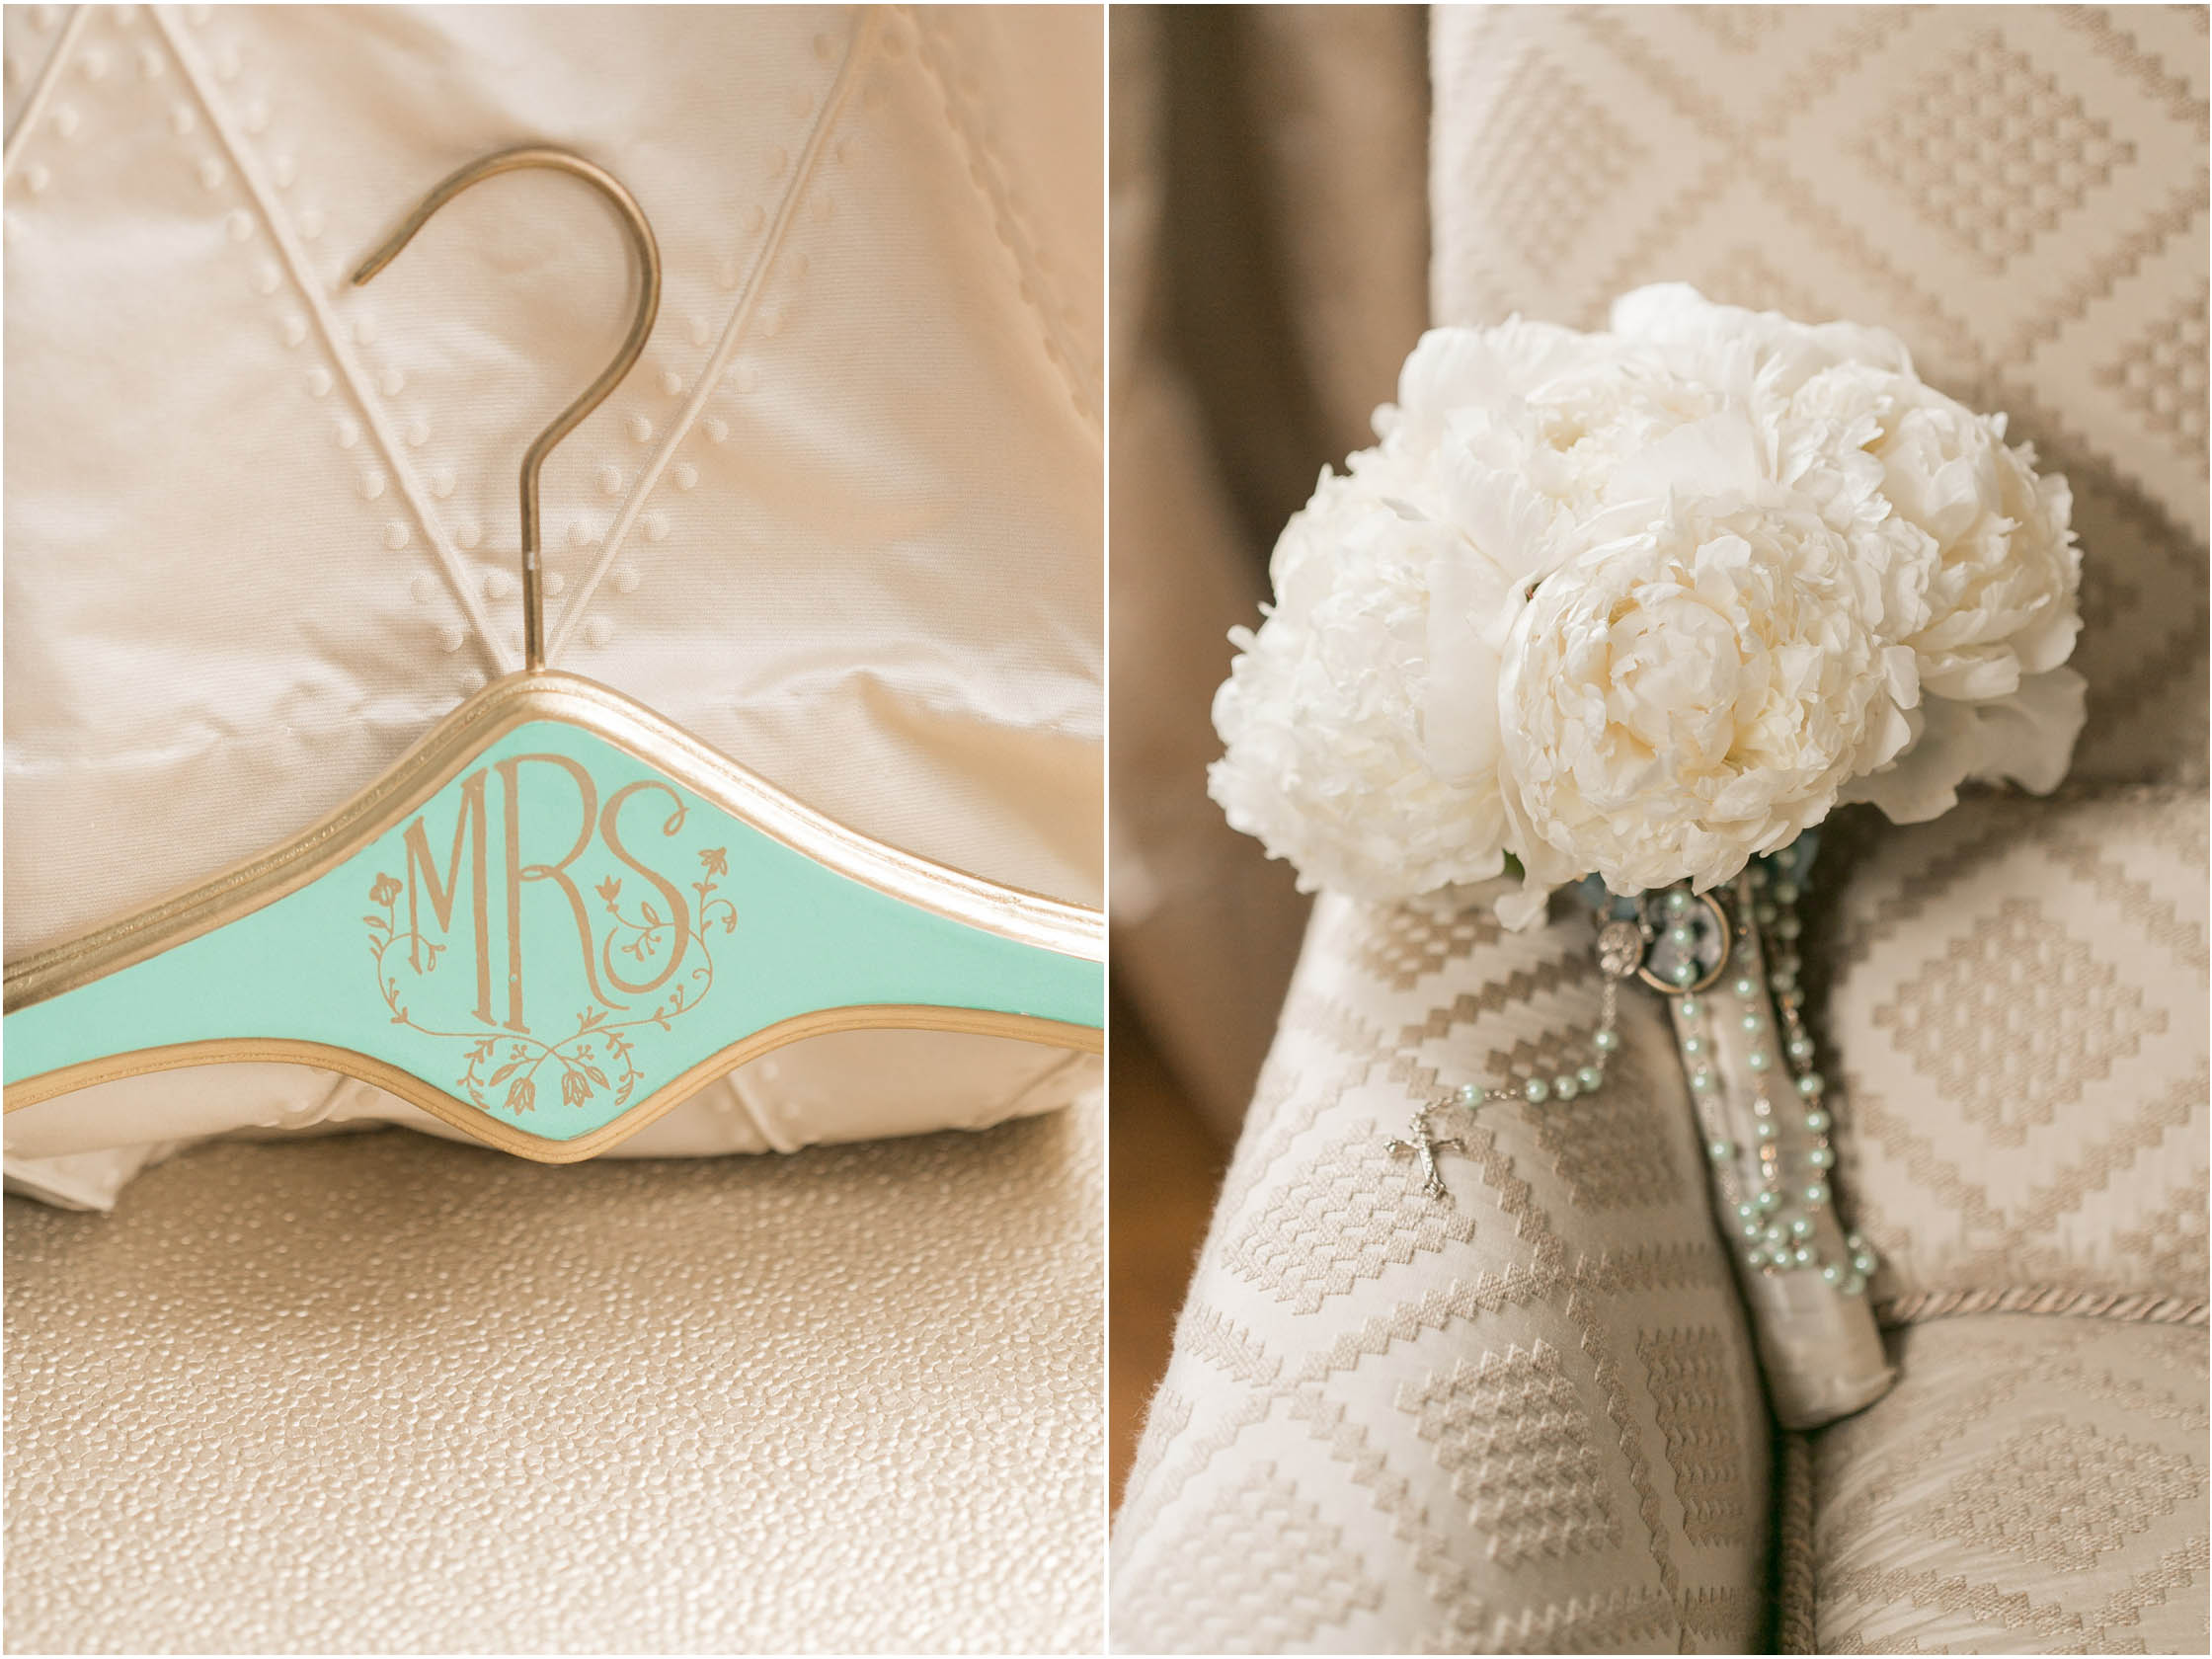 New Orleans Civic Theatre Wedding bouquet - 02